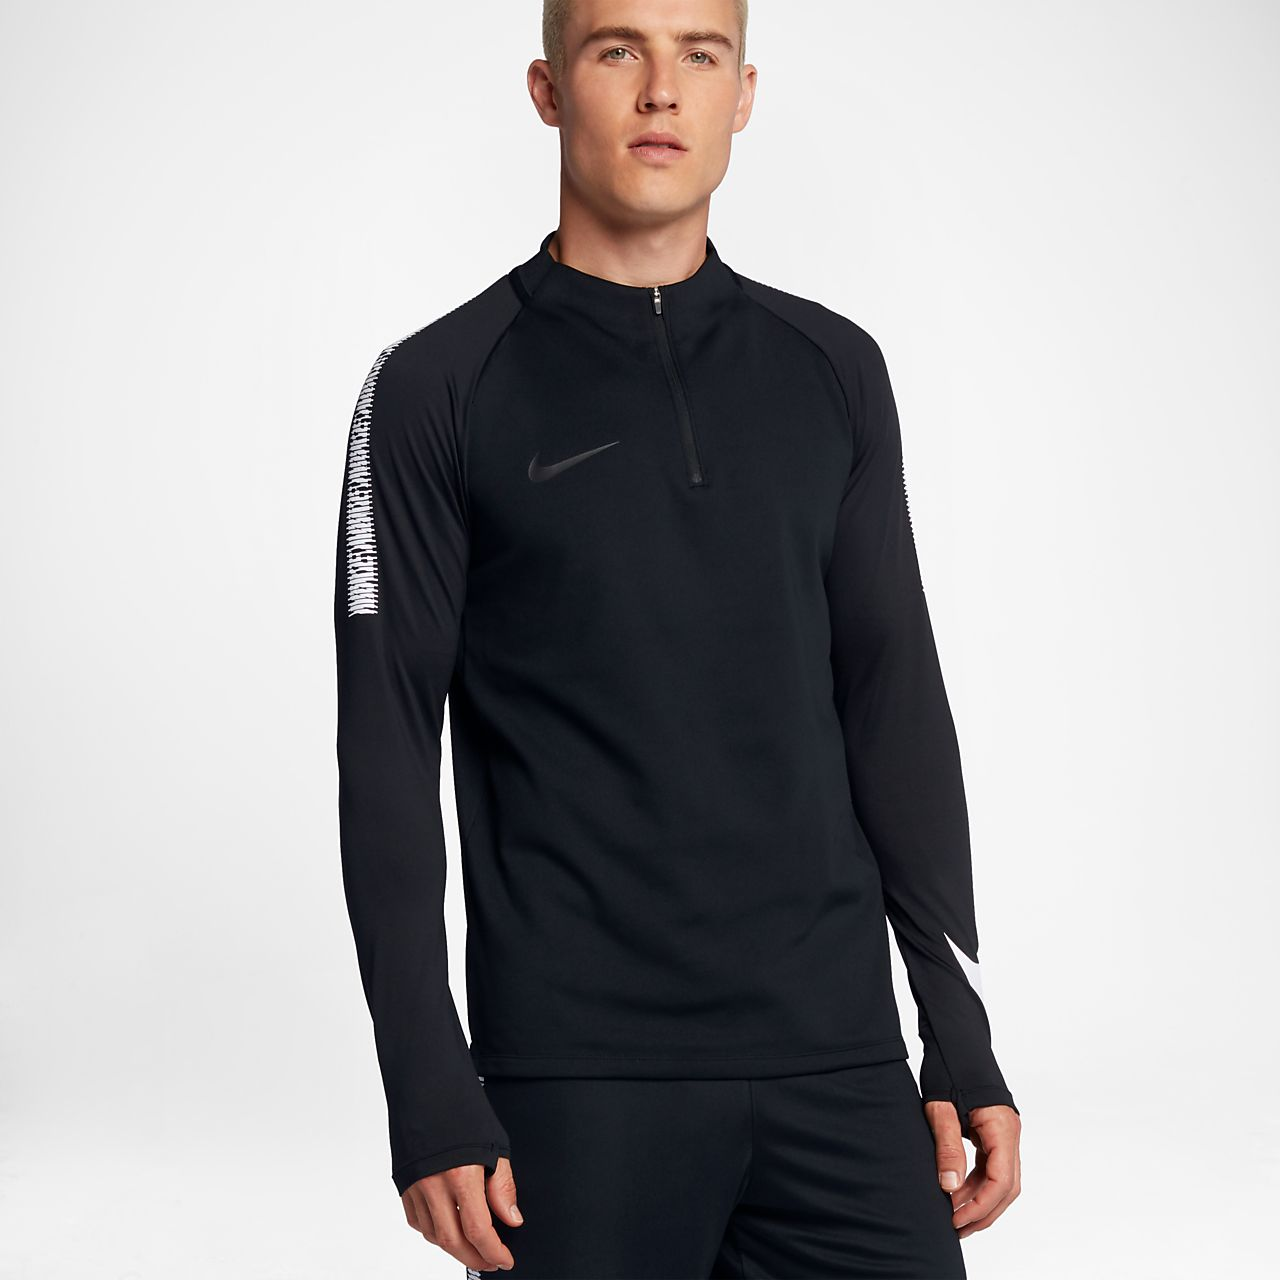 Nike - Football Training Squad Dry Drill - Top - Noir 859197-010 - NoirNIKE SPORTWEAR ultqLx8